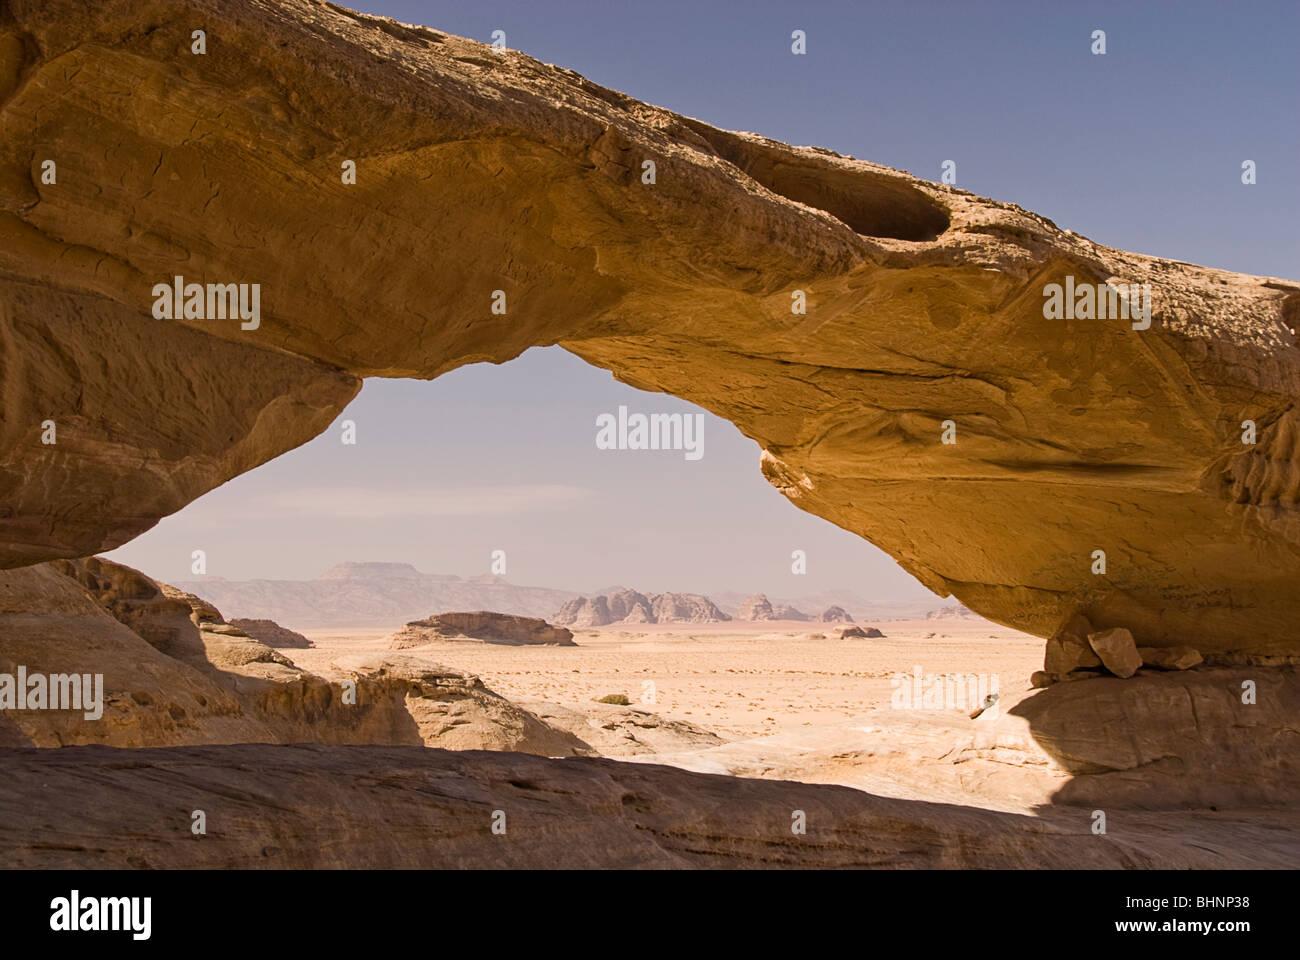 Rock arch, desert landscape, Wadi Rum, Jordan, Asia. - Stock Image